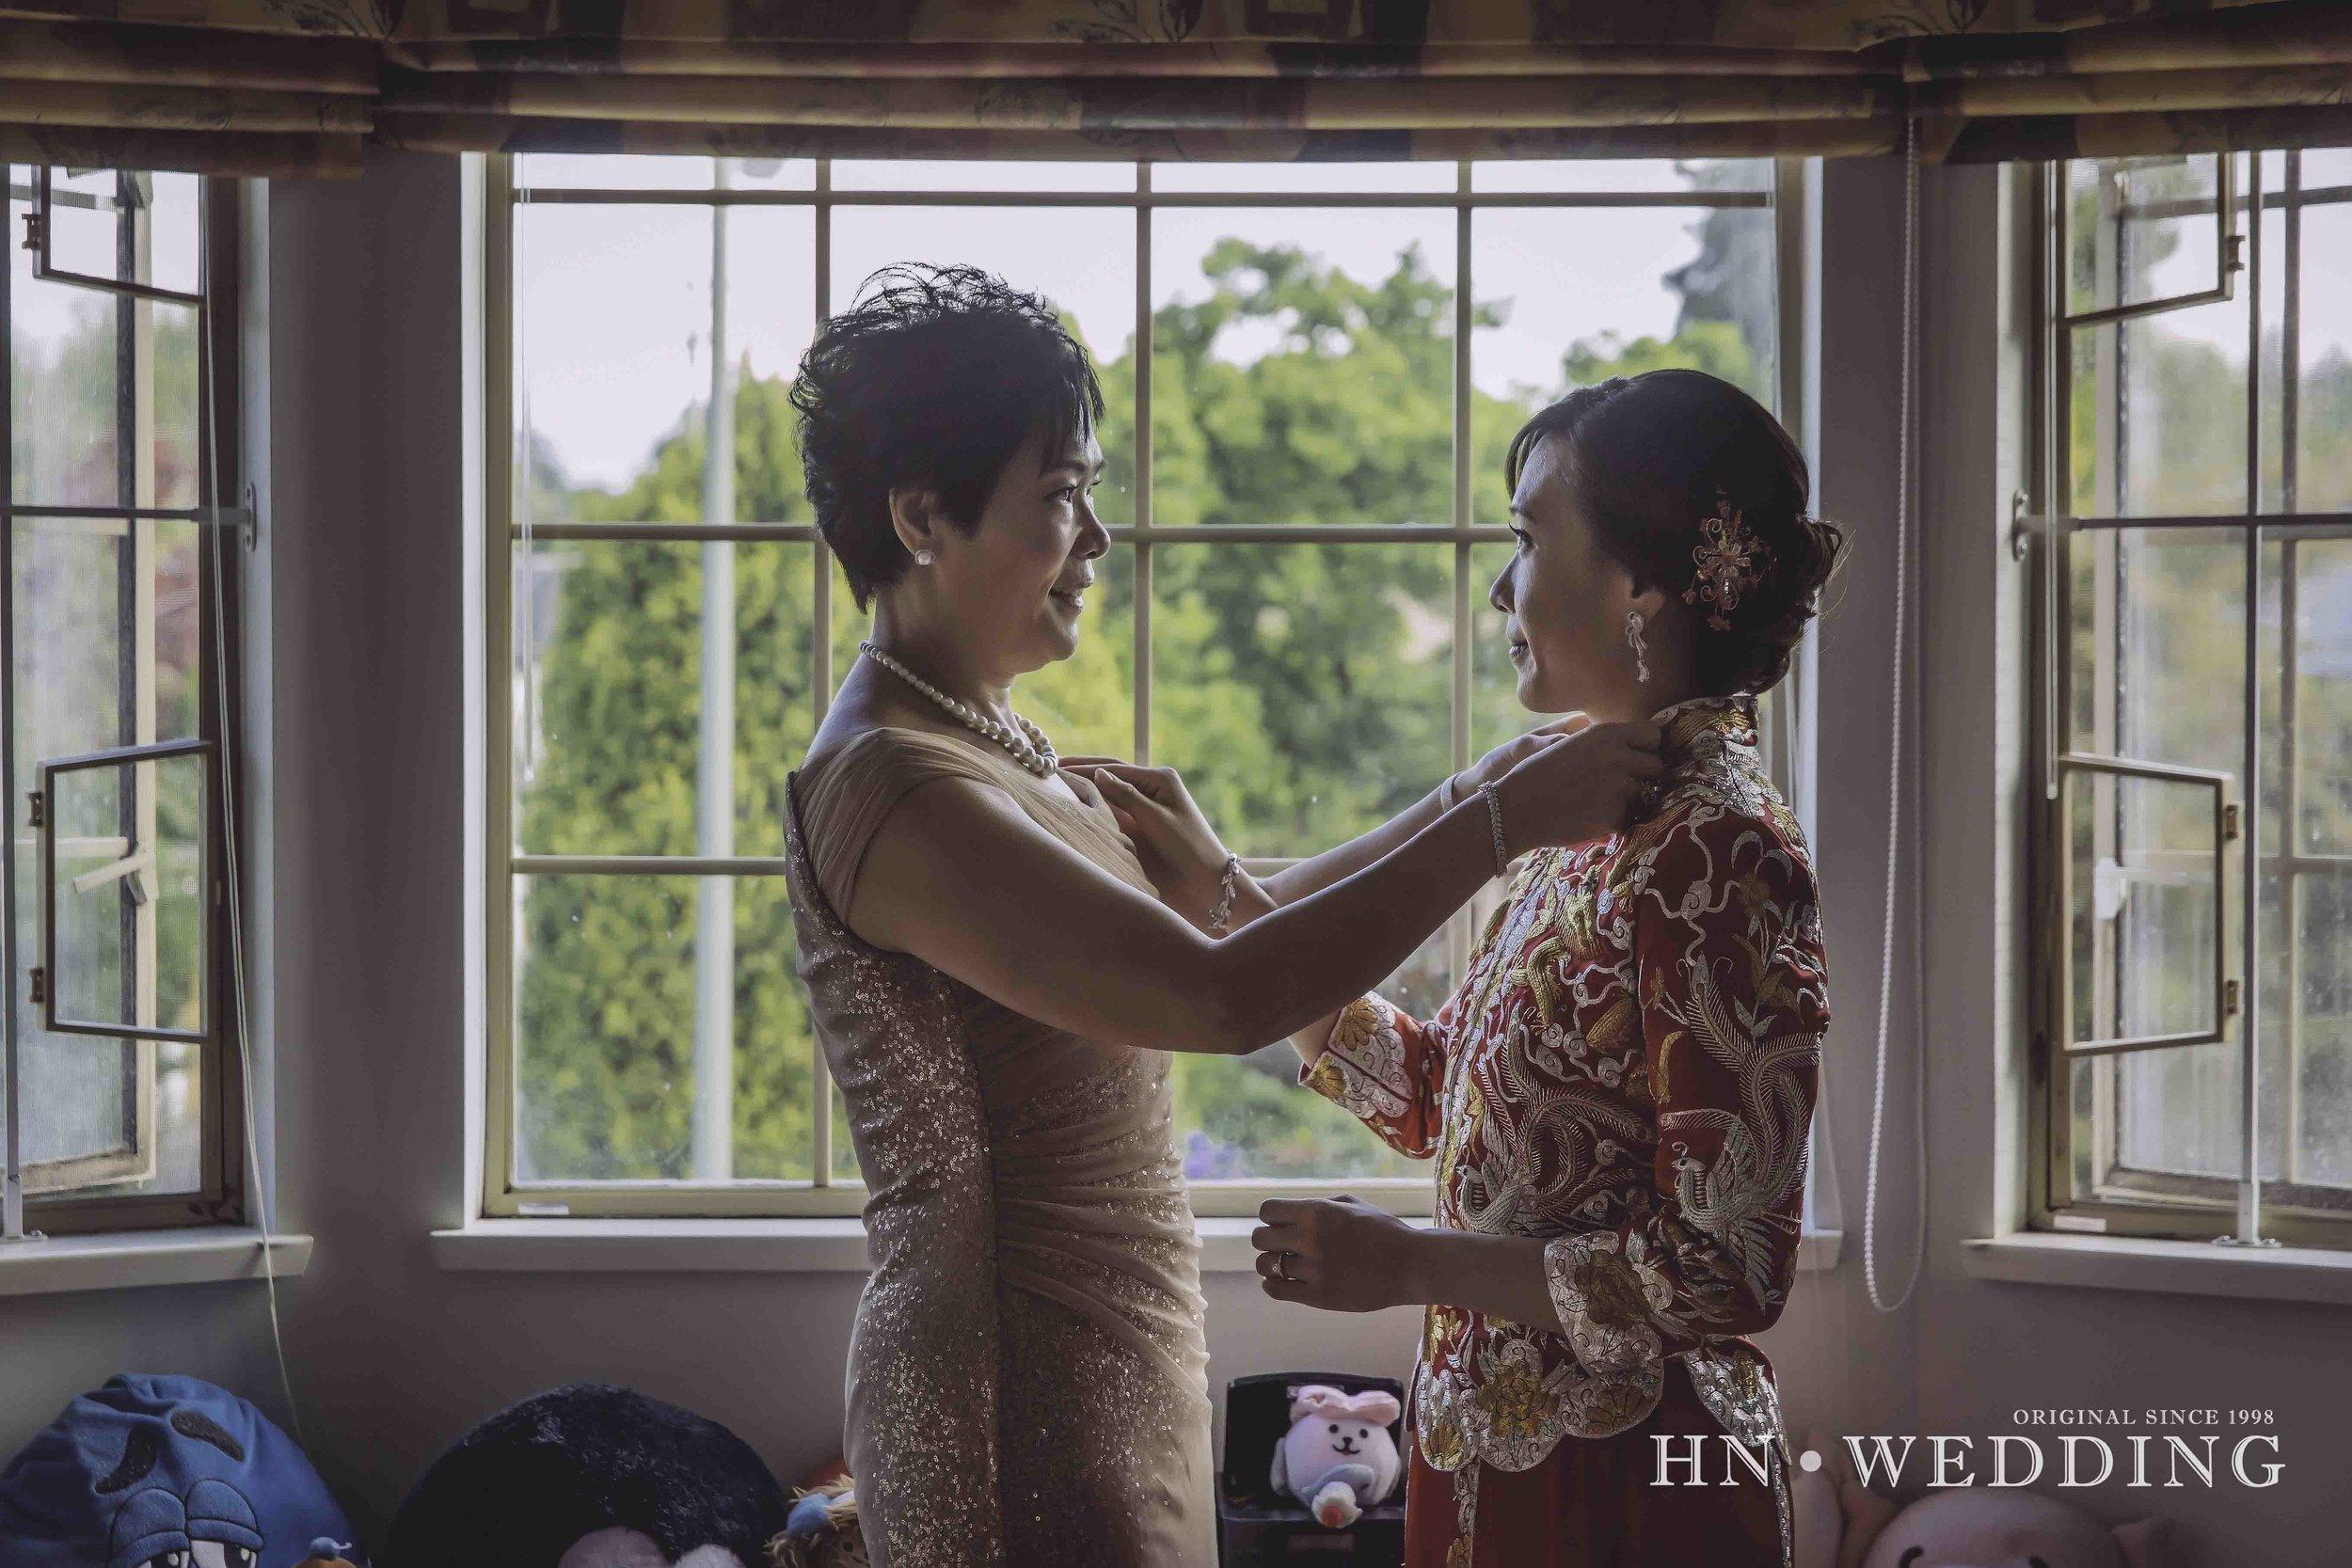 HNwedding-20160822-wedding-5373.jpg